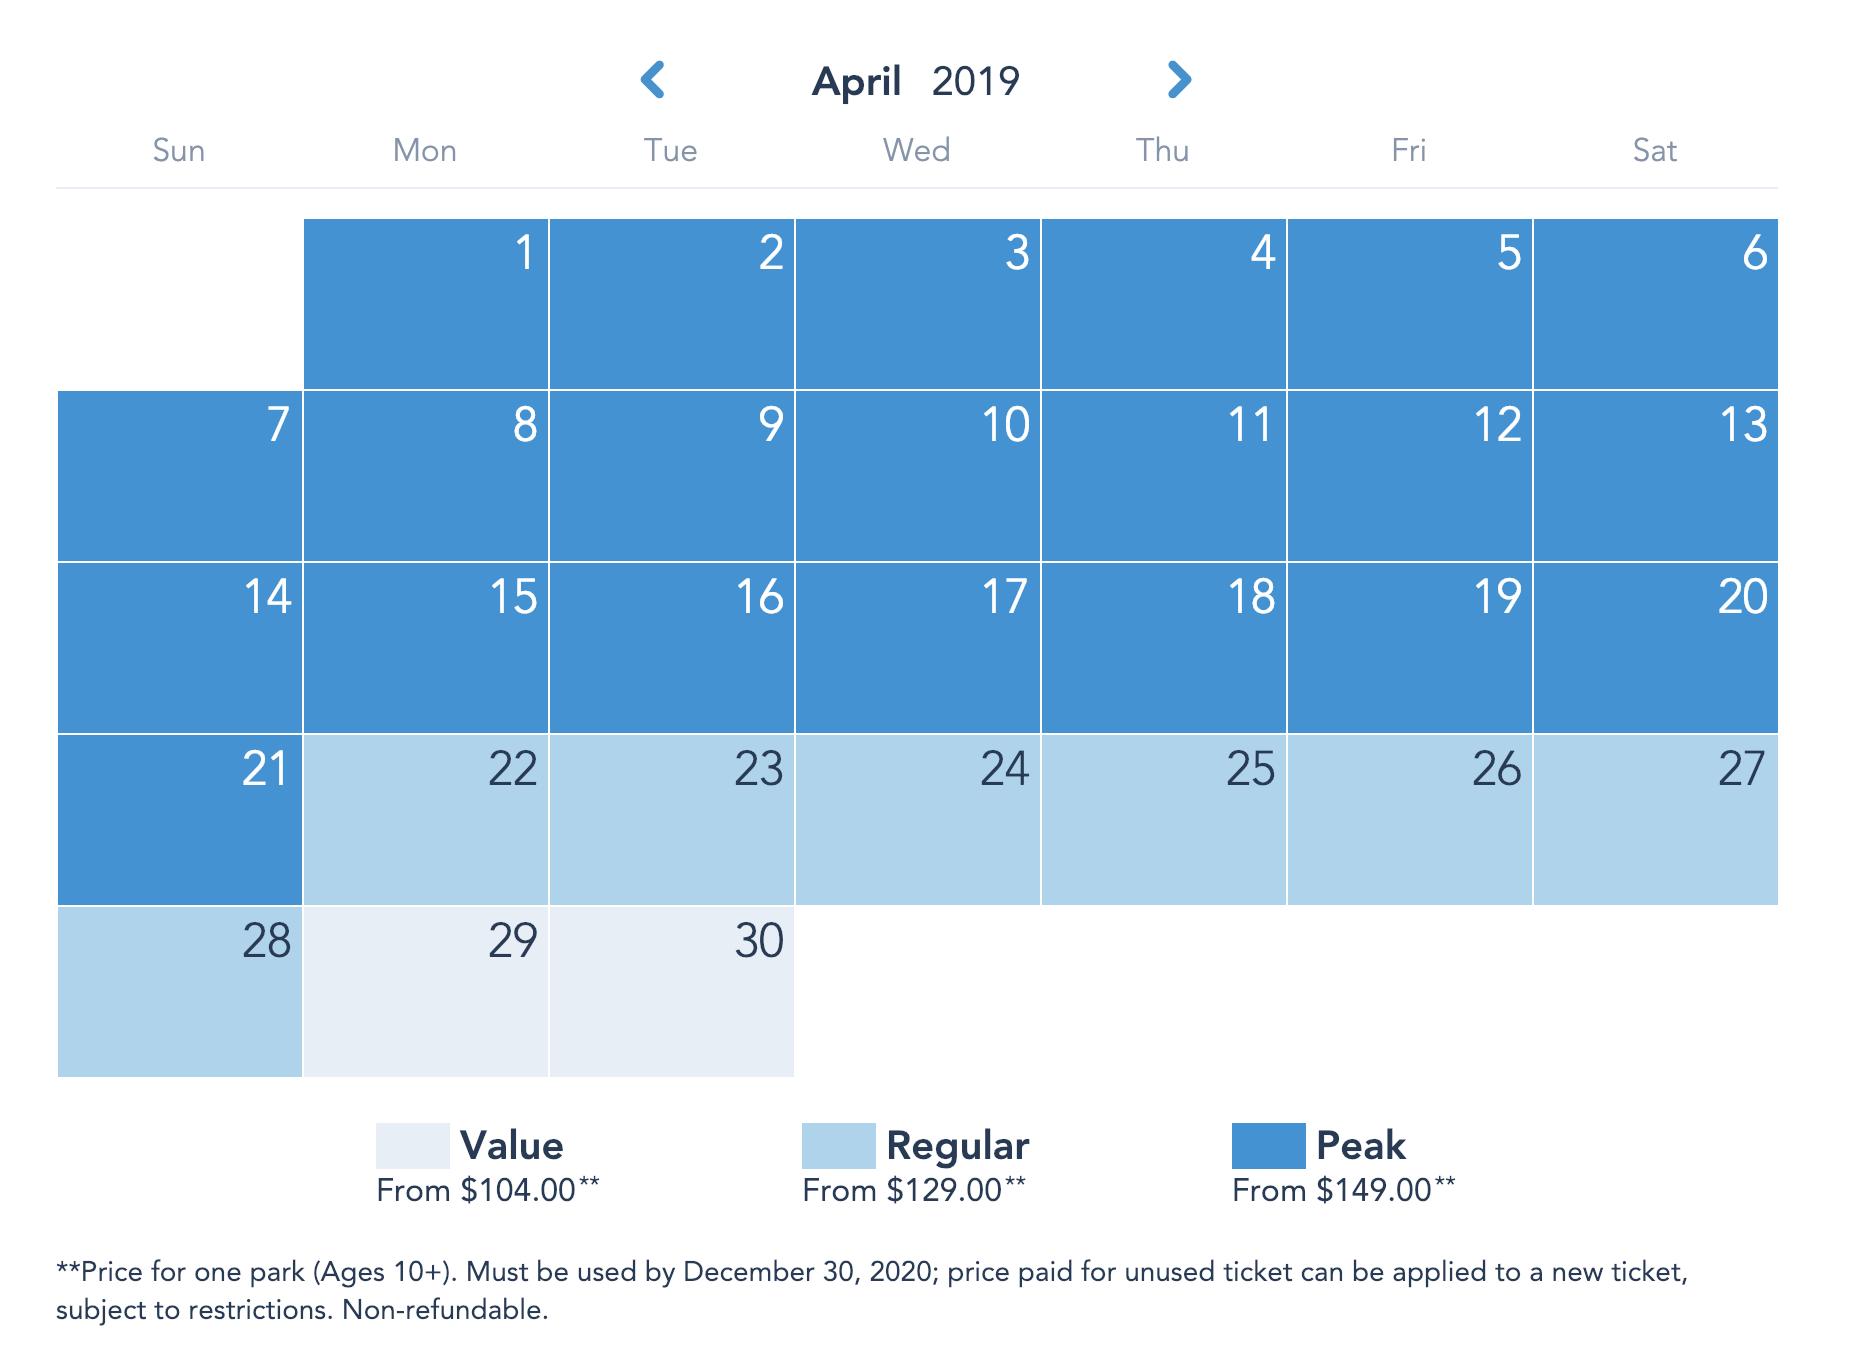 Disneyland Resort Prices - April